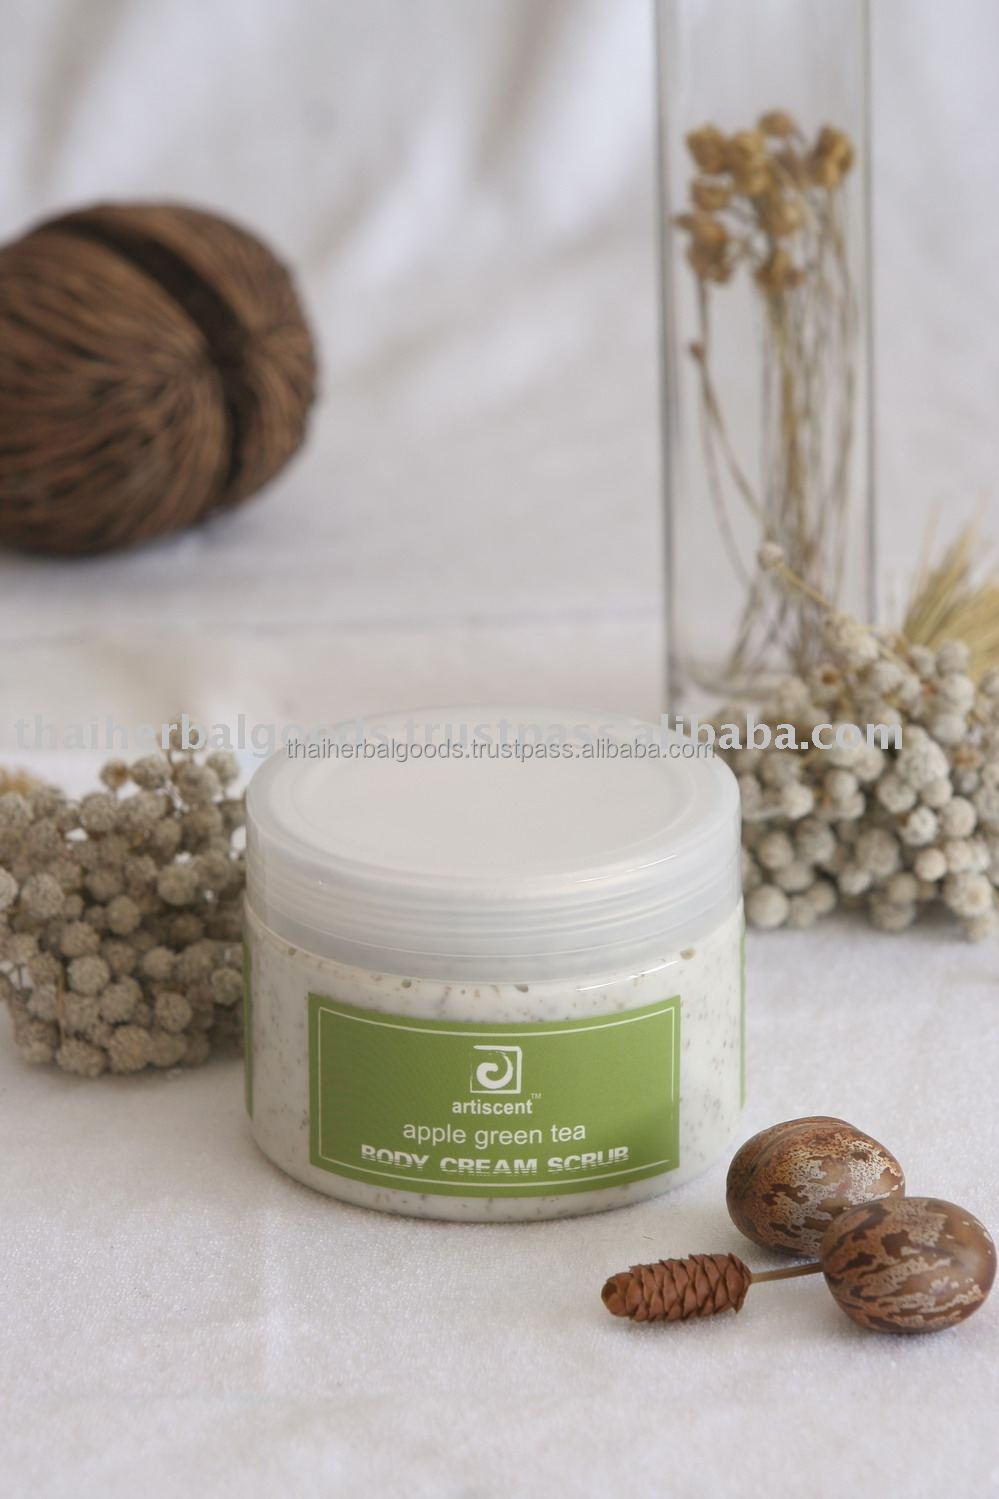 body cream scrub natural spa product buy body polishing cream exfoliating body scrubber. Black Bedroom Furniture Sets. Home Design Ideas